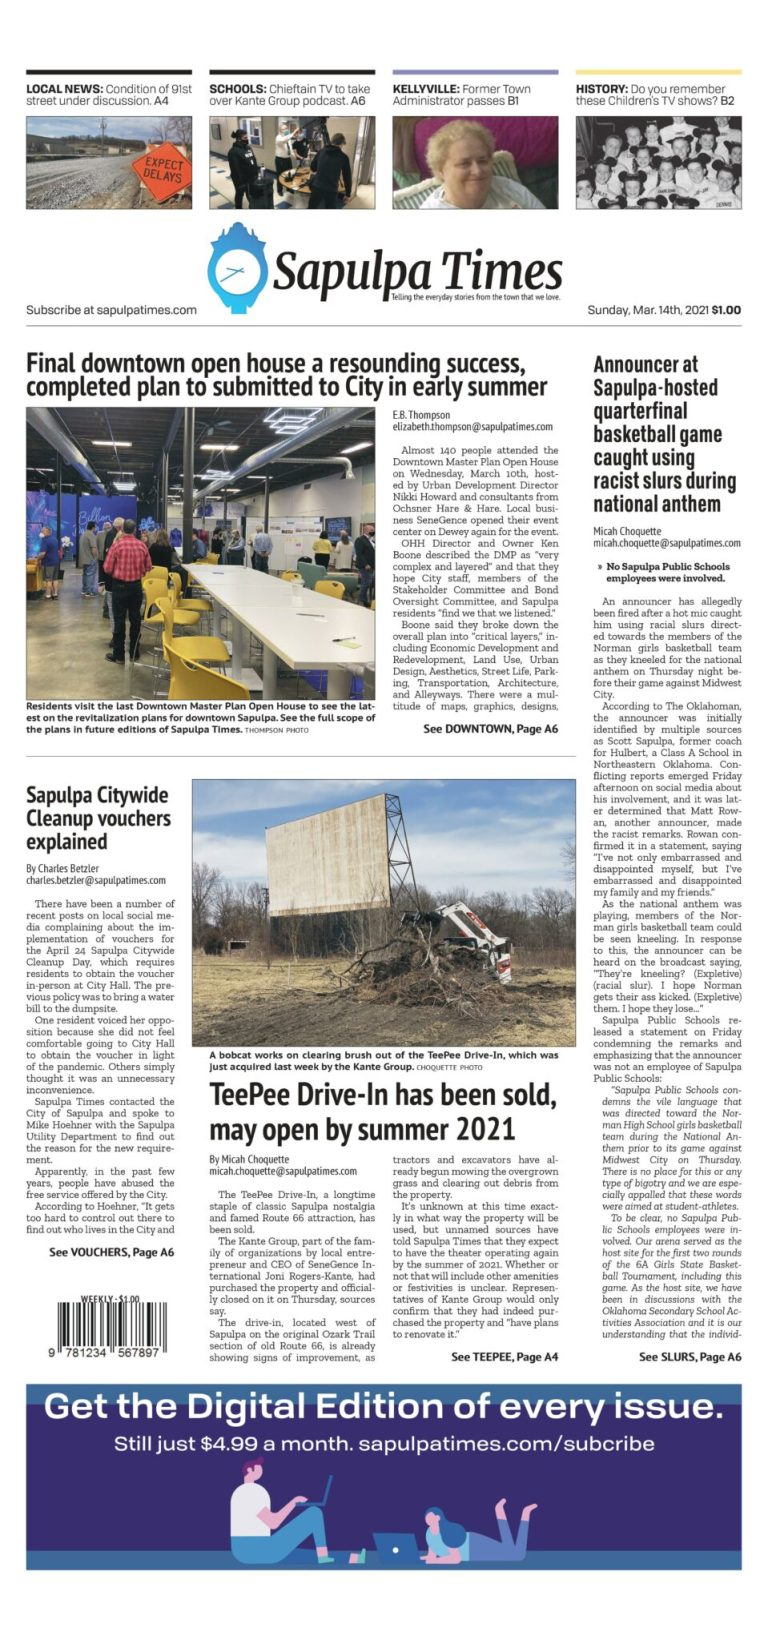 Sapulpa Times Digital Edition 03/14/2021